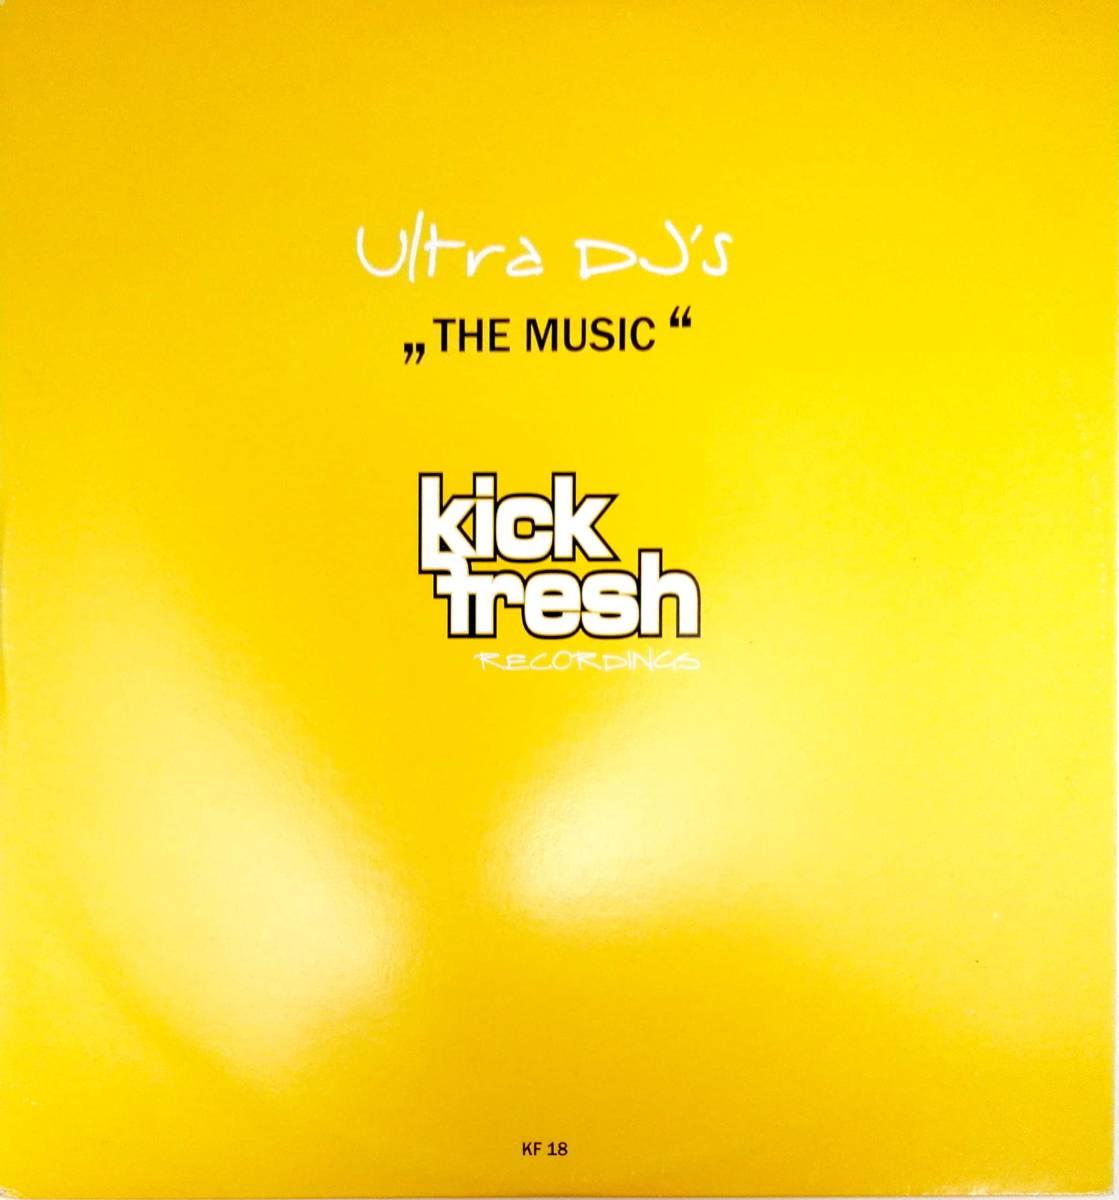 2858【LP盤】★☆ めったに出品されない◎The Music (Extended Mix)  Ultra DJ's ☆★ ≪貴重レコード≫  おまとめ発送も可_画像1